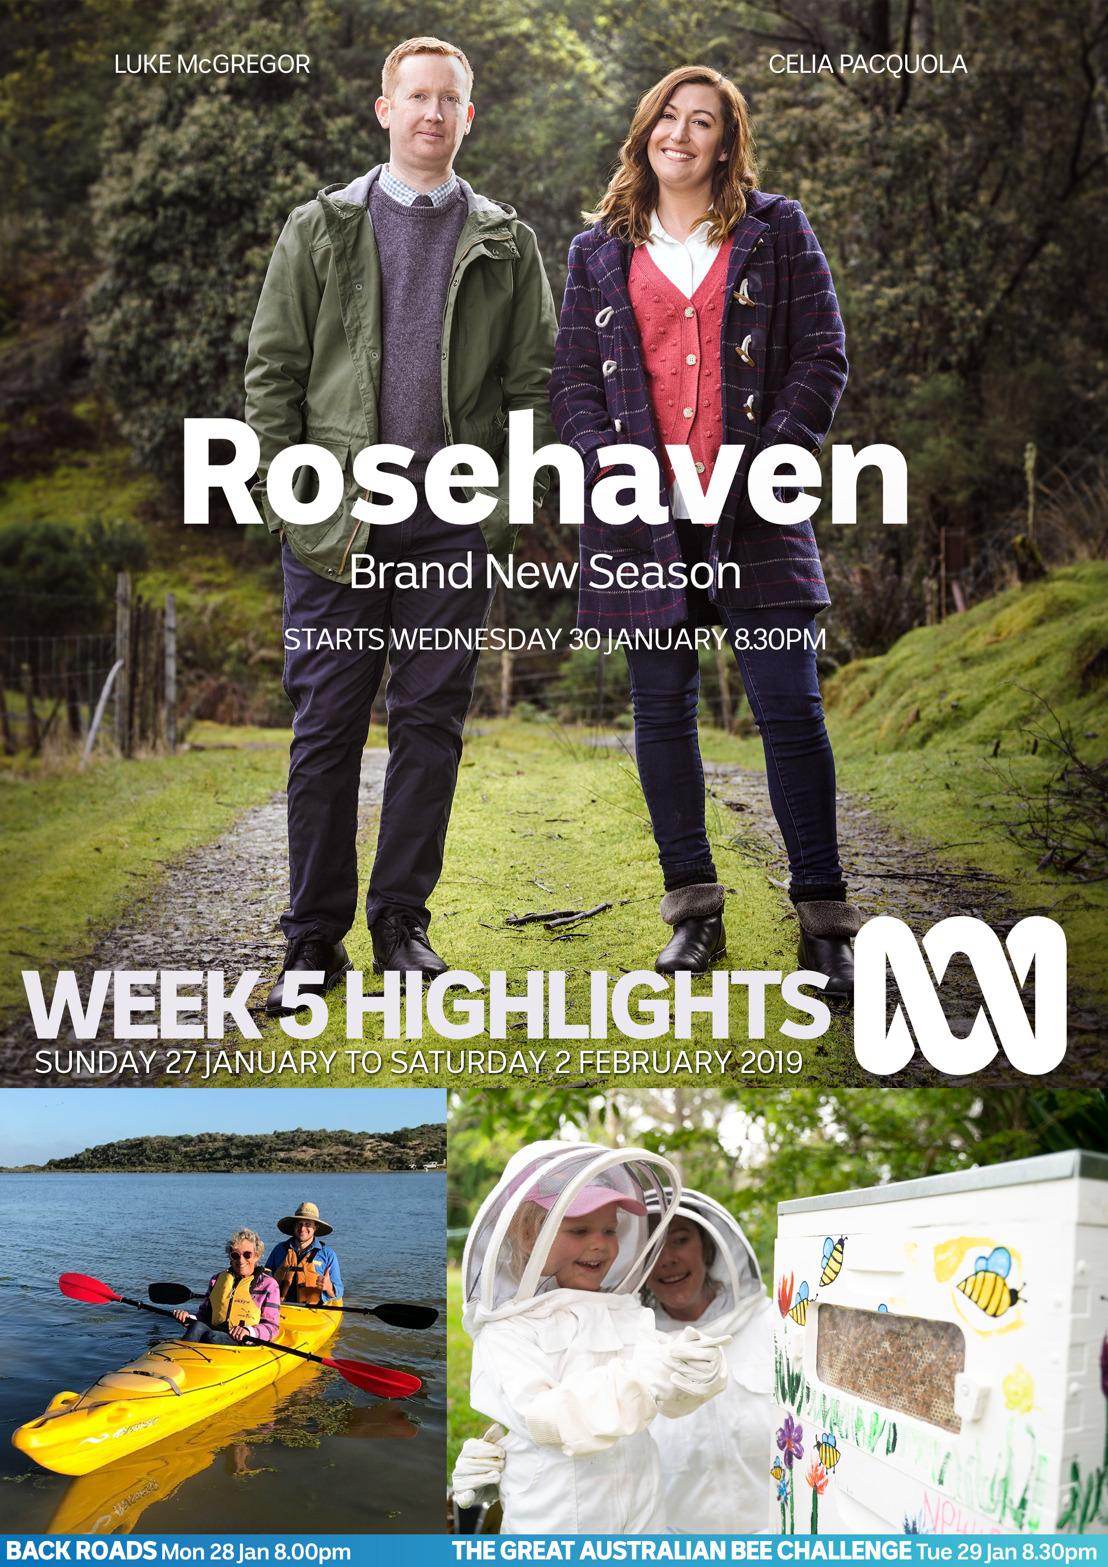 ABC TV Program Highlights - Week 5